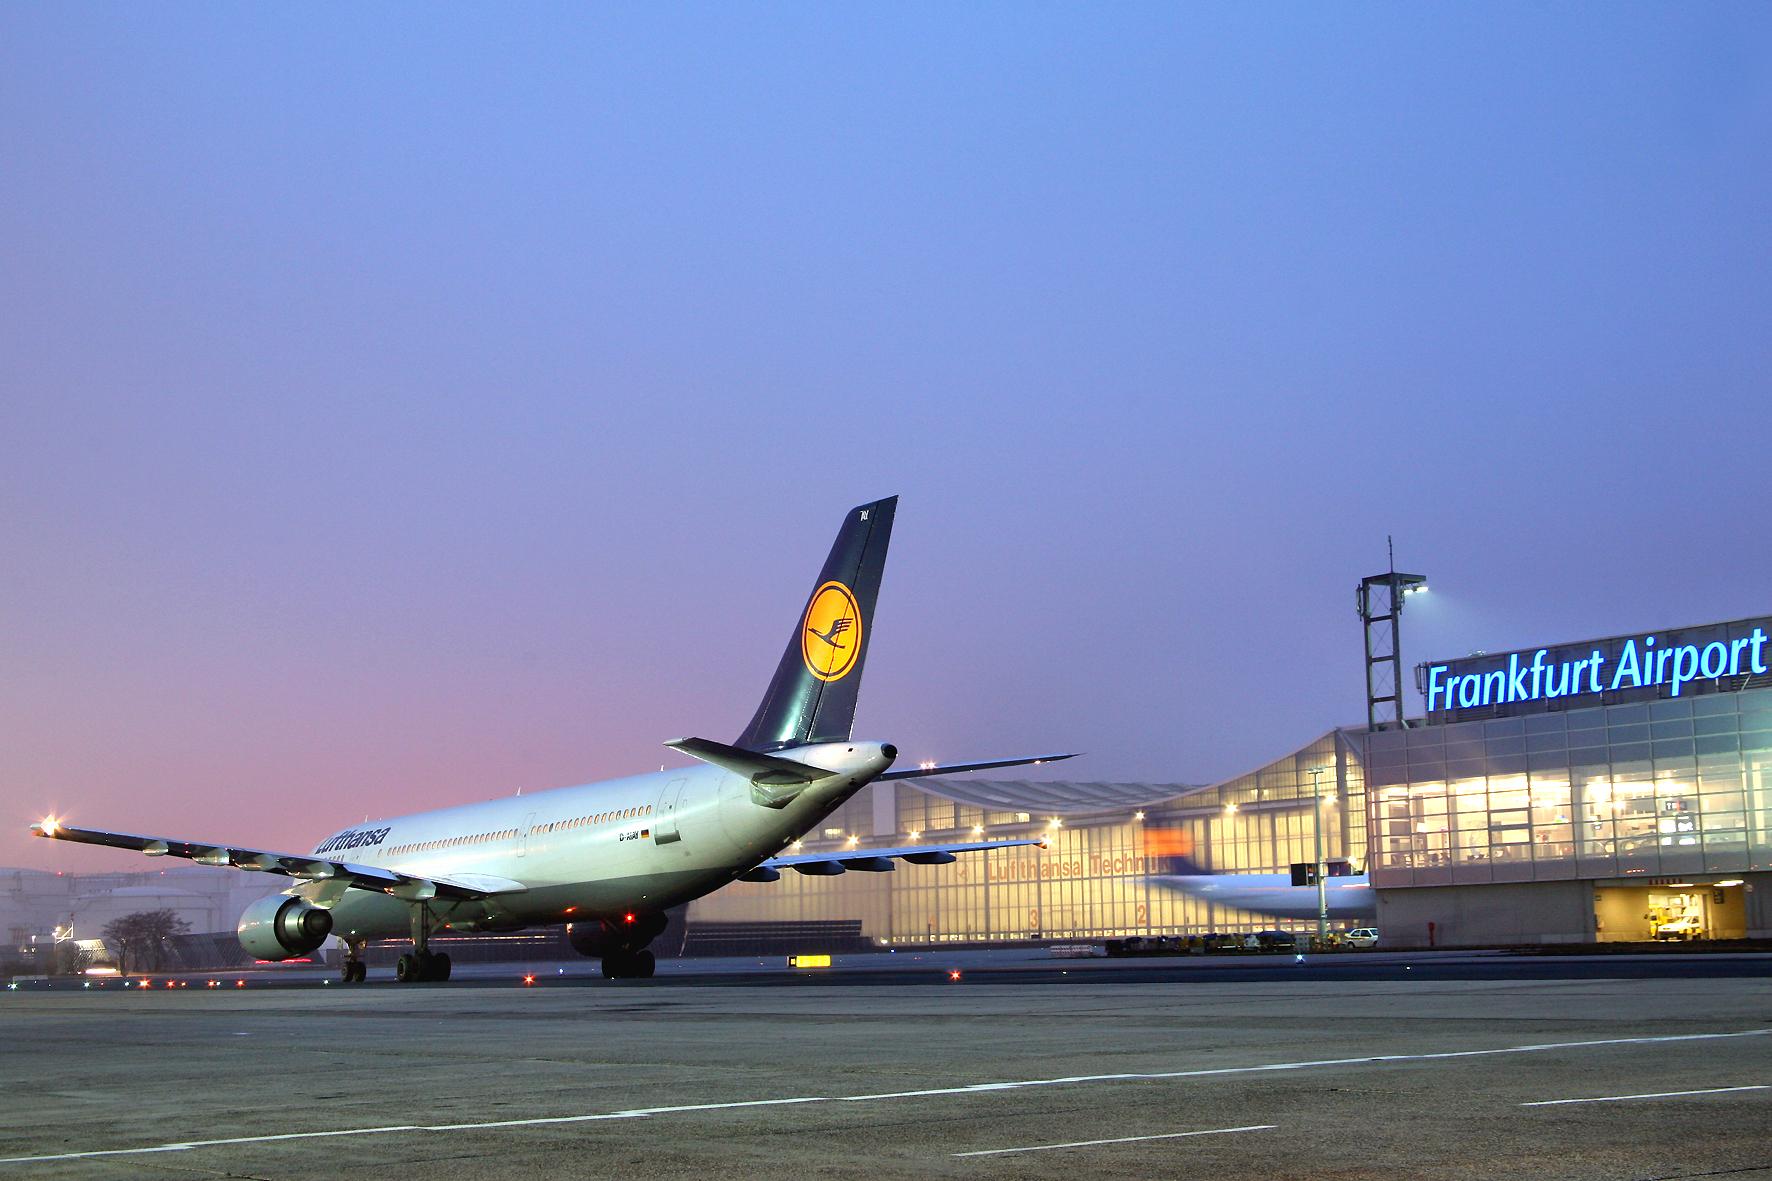 mid Groß-Gerau - Der Flughafen Frankfurt am Main gilt als internationales Drehkreuz. Fraport AG